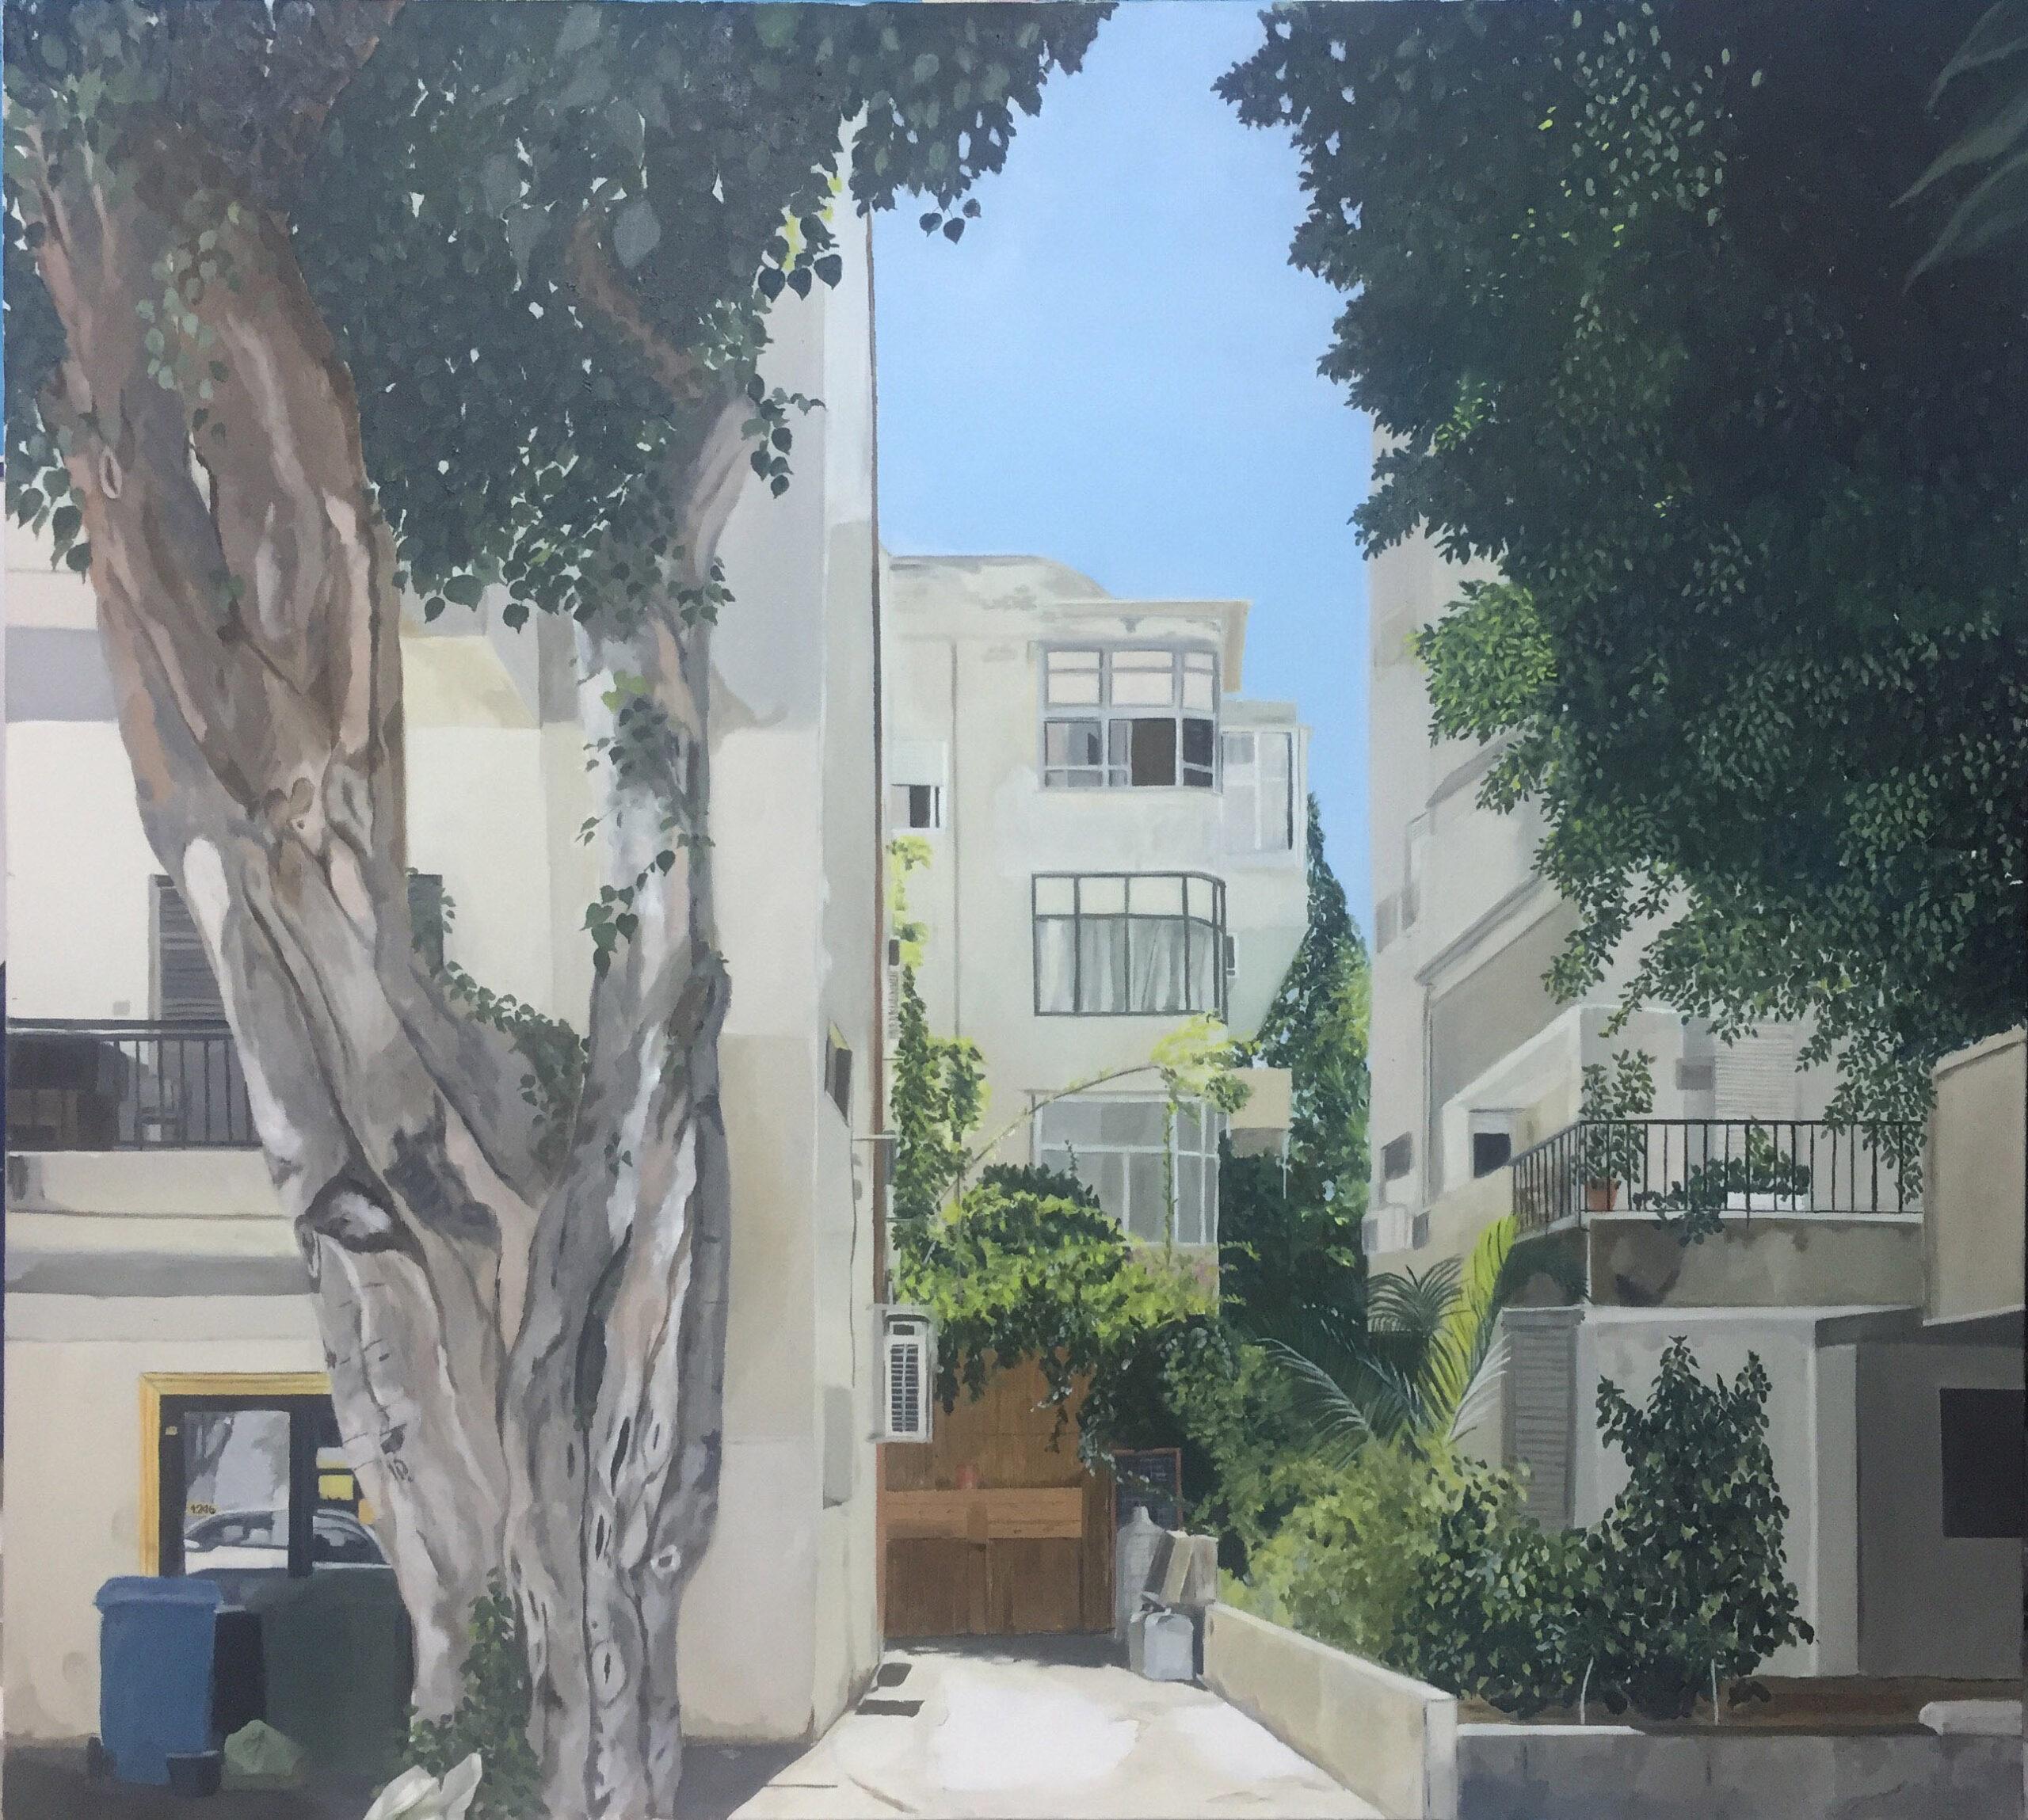 Tel Aviv White City II. Zohar Flax. Jackson's Painting Prize.